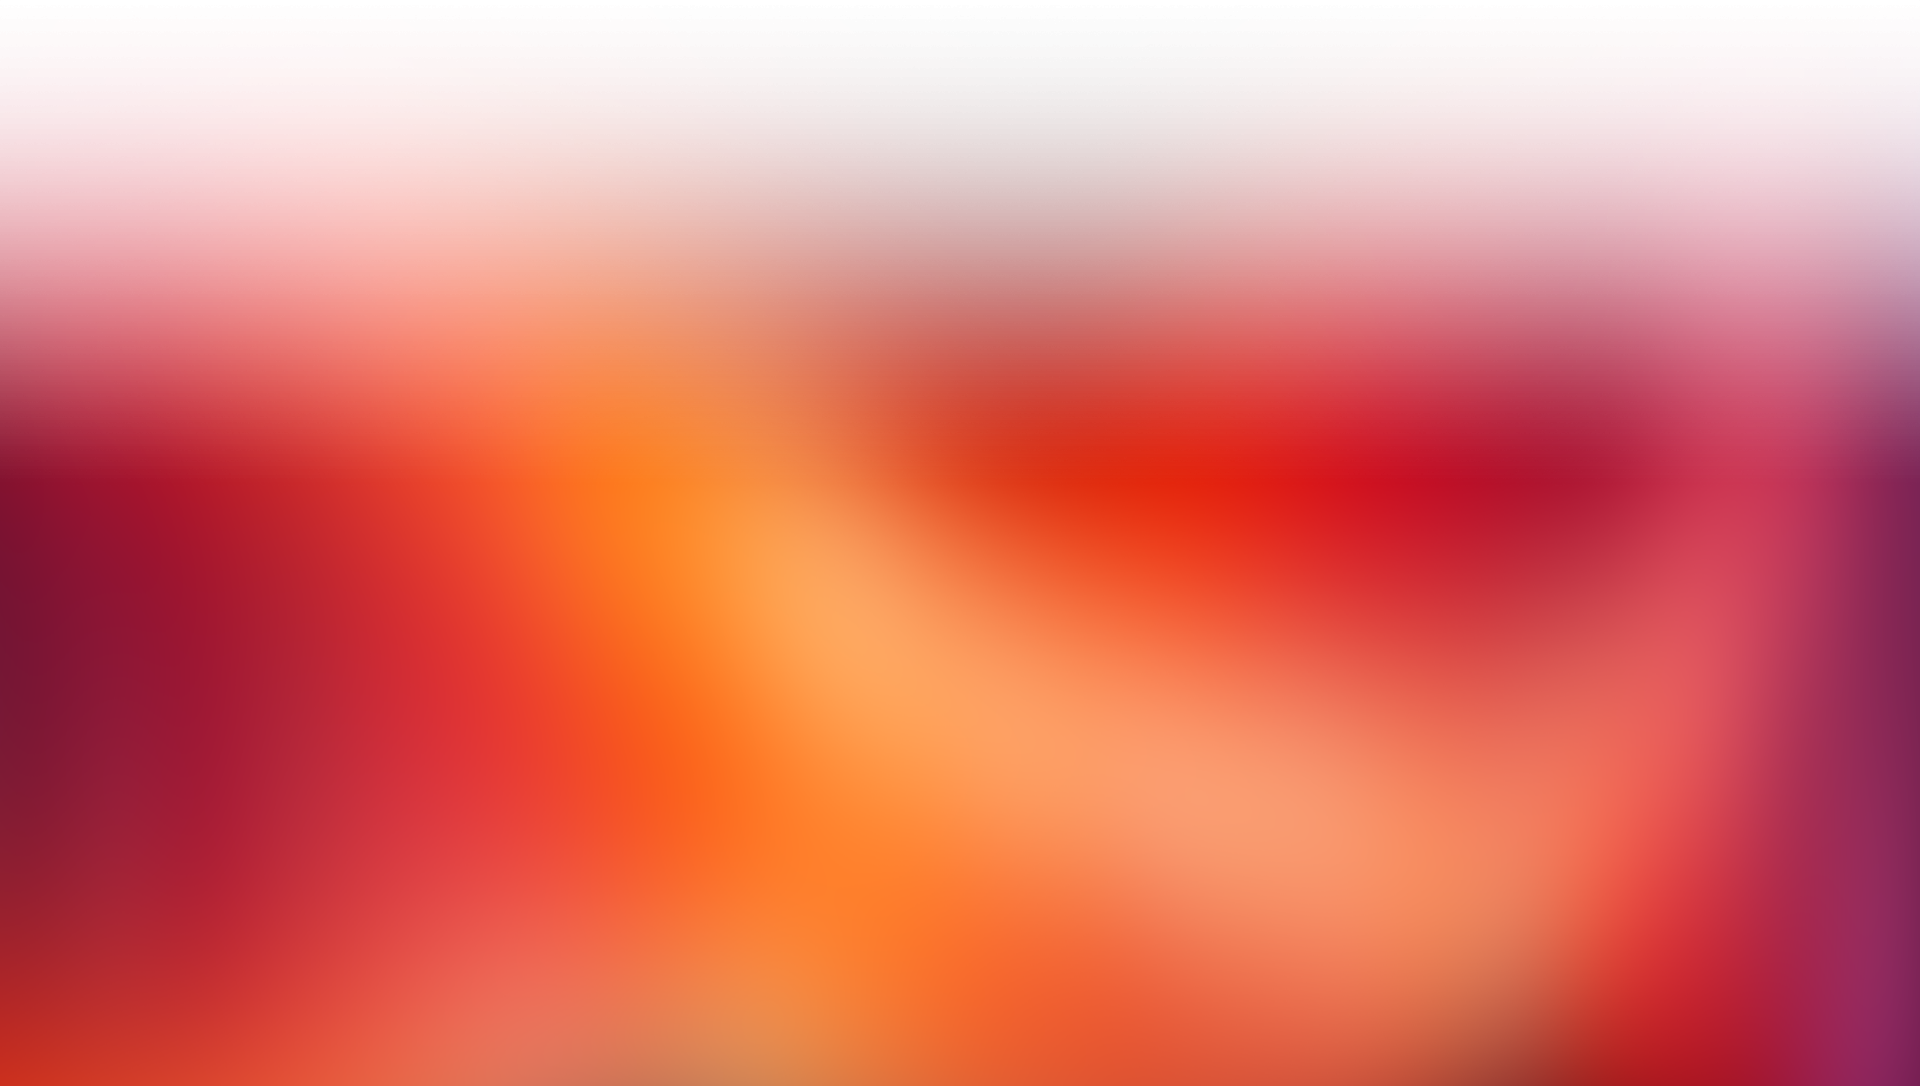 AOCG_AD110D0_FV_FW_VESA_BACKGROUND.png